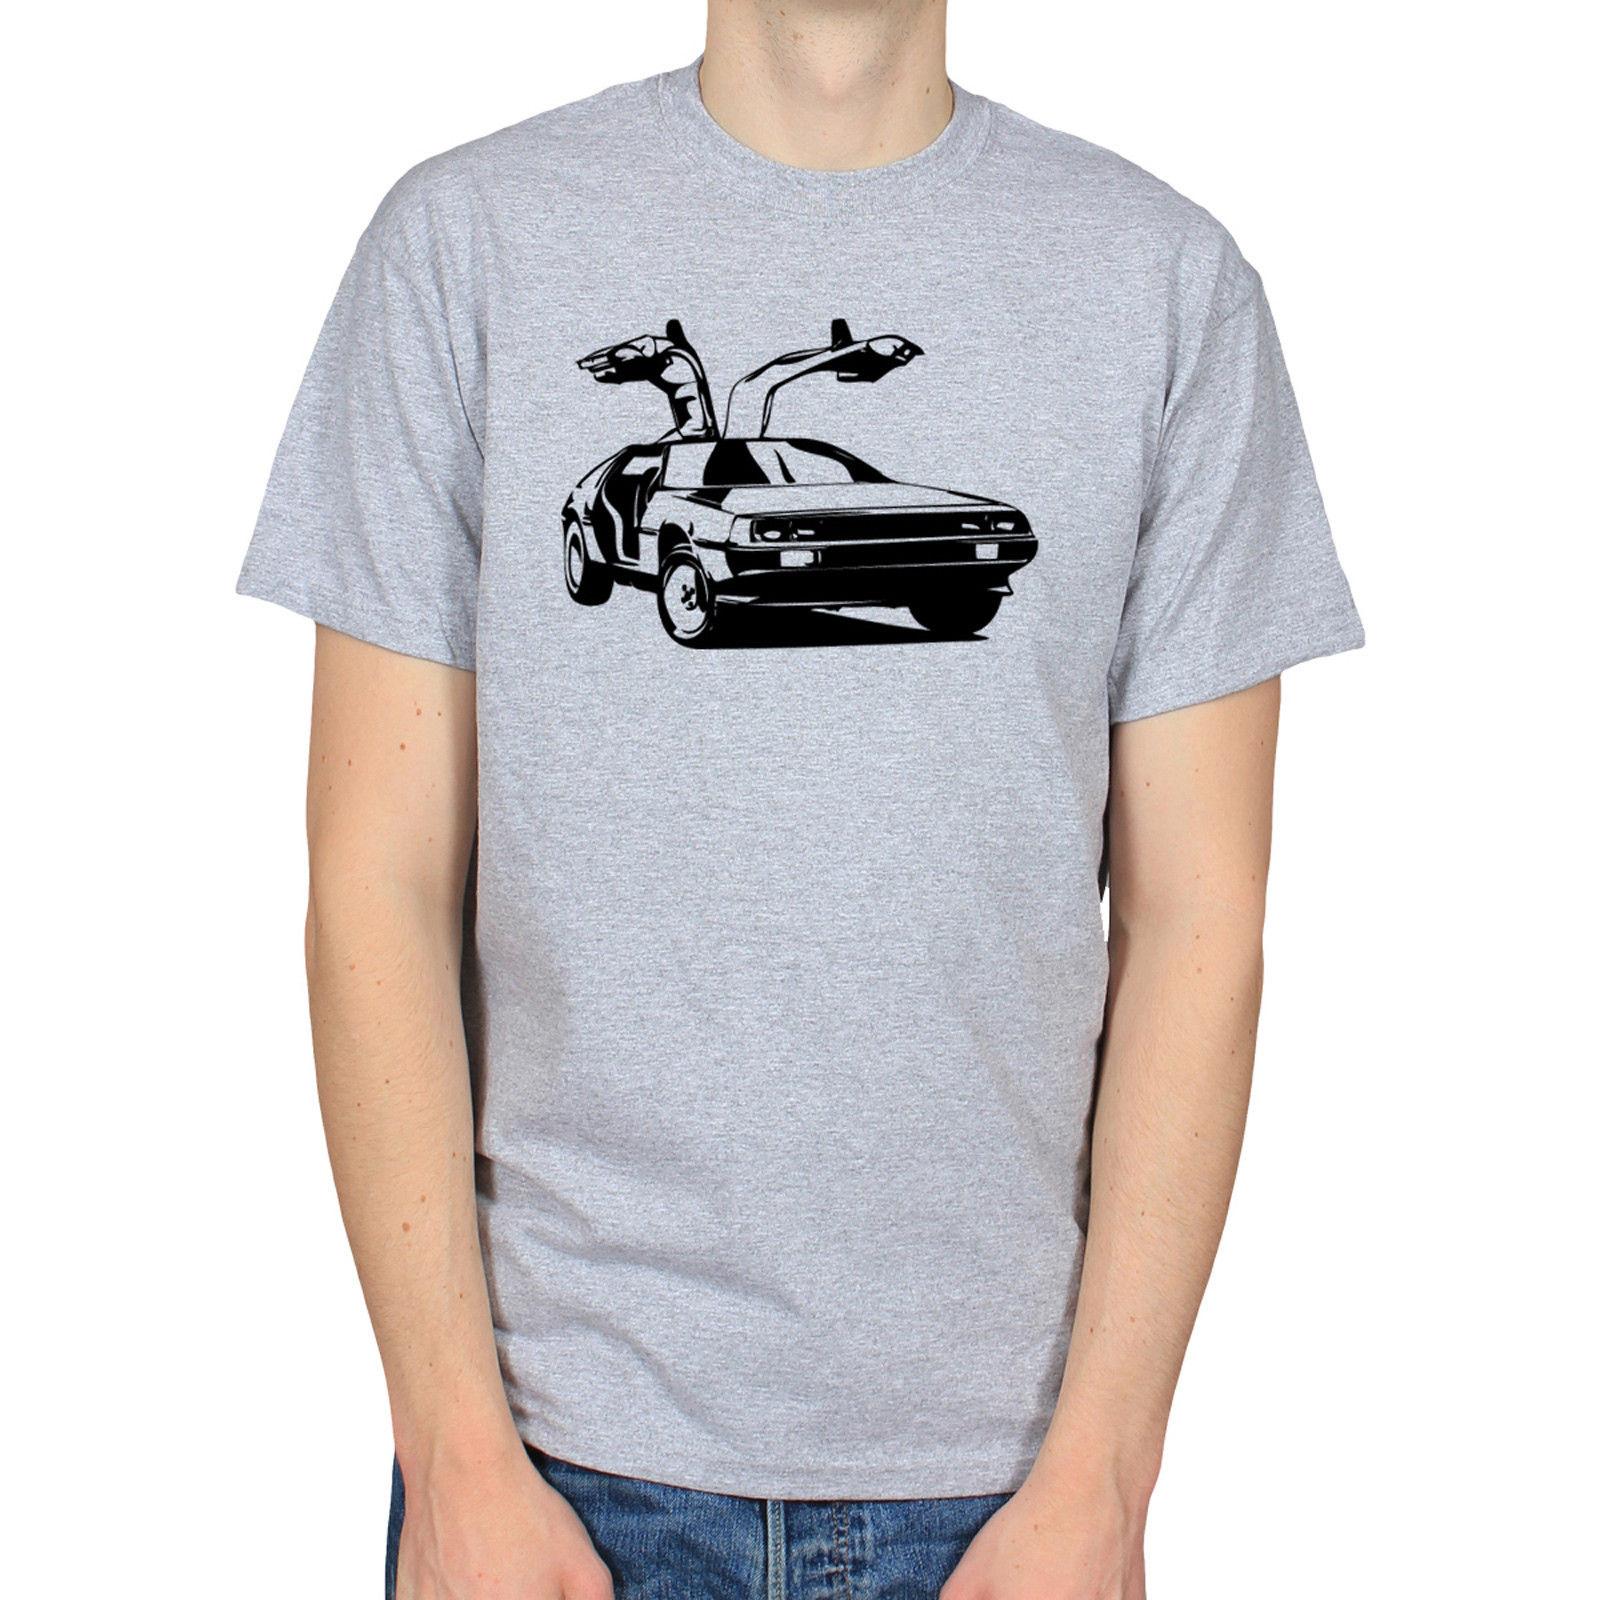 Filme de Volta para o Futuro Delorean 80s Carro Capacitor de Fluxo t-shirt Masculina Melhor Venda Camisas de T